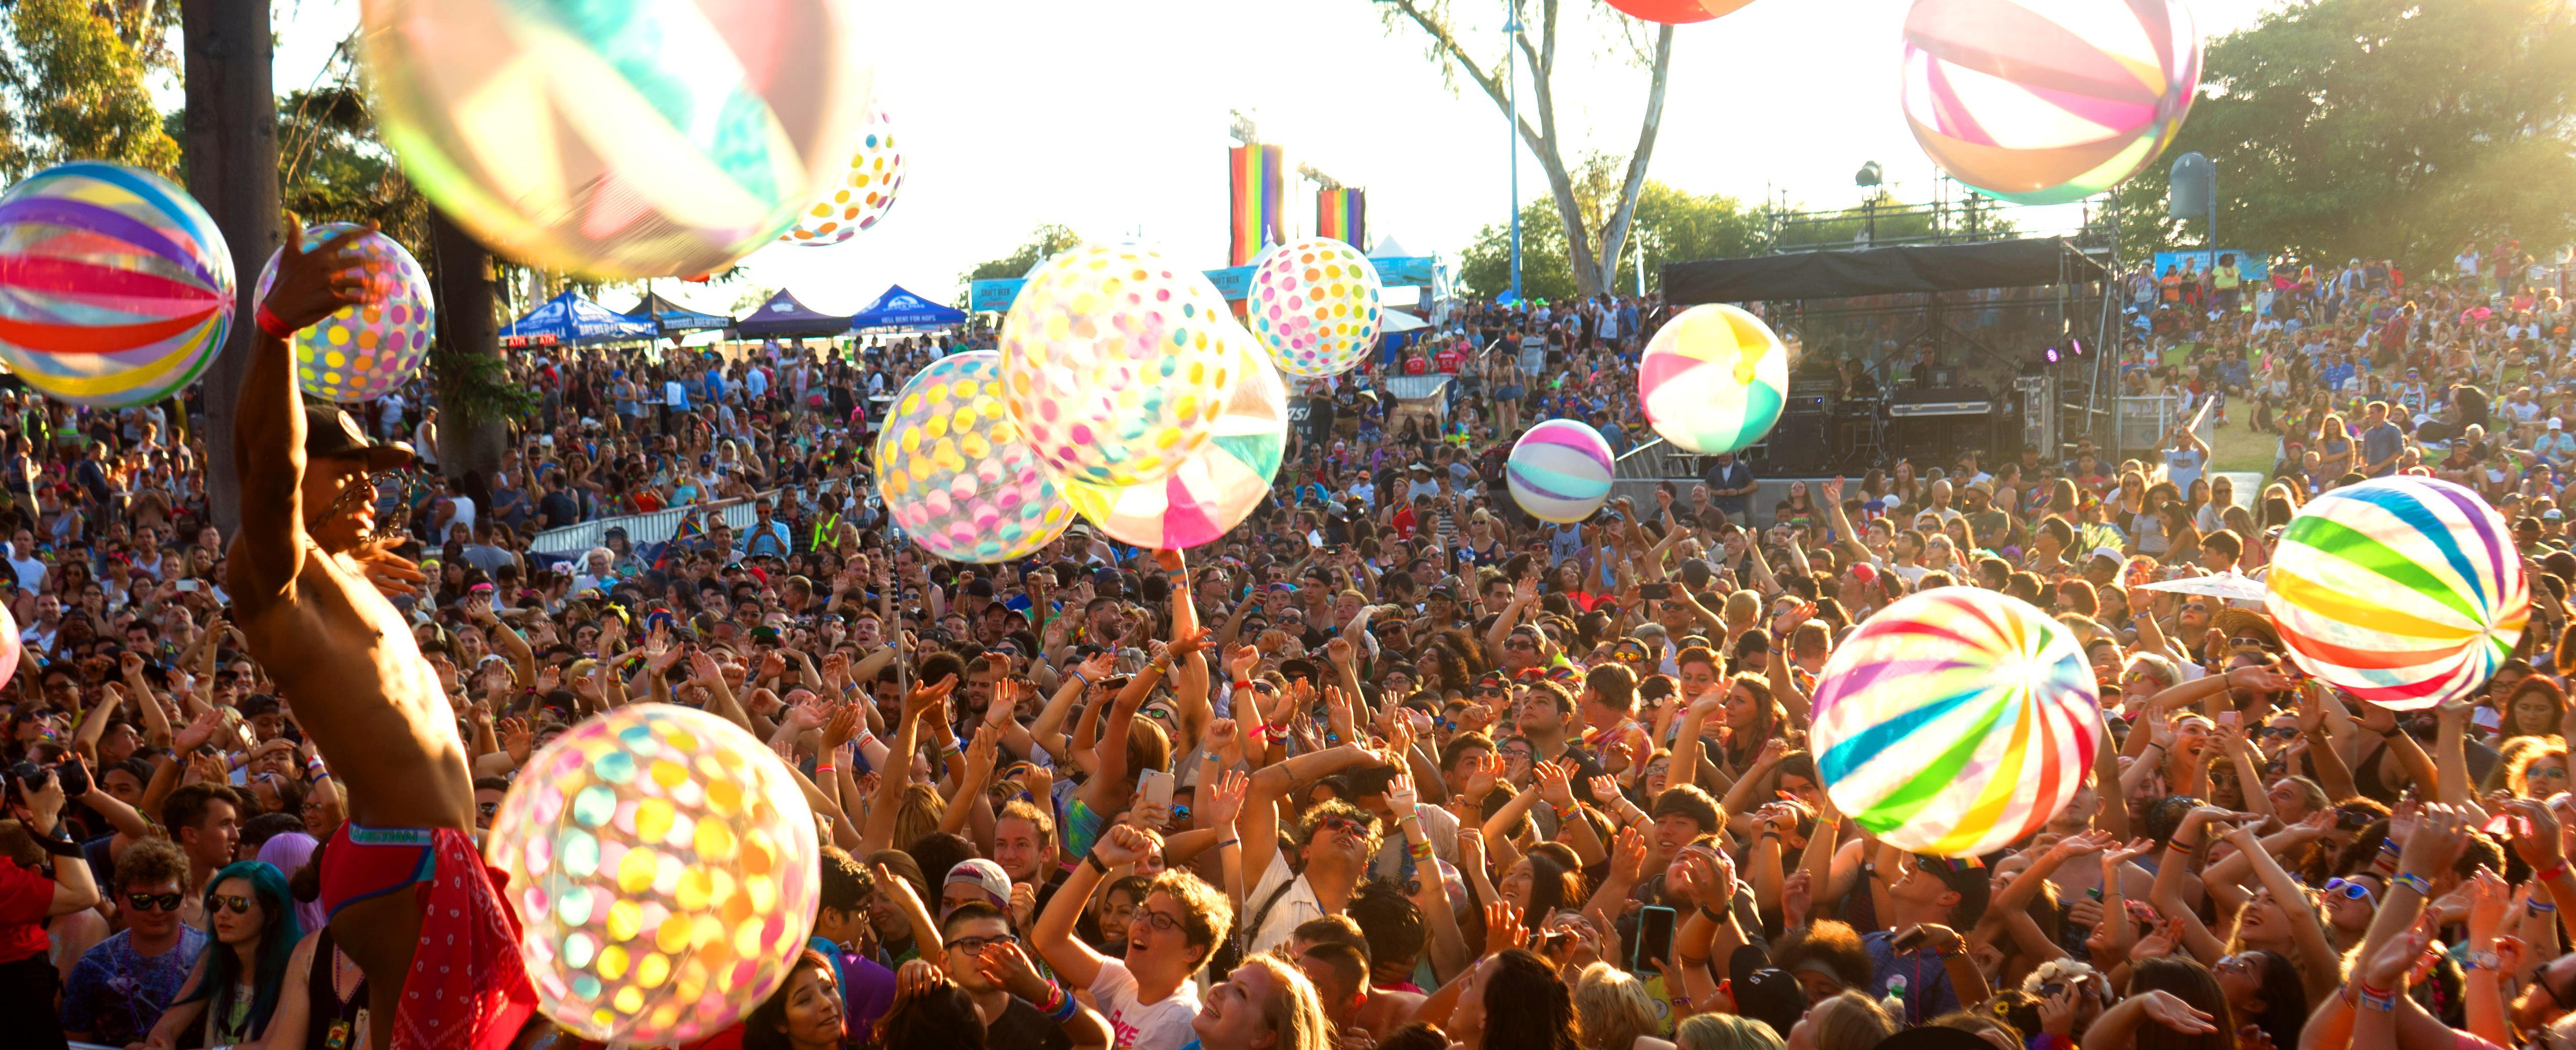 Annual LGBT Pride Music Festival